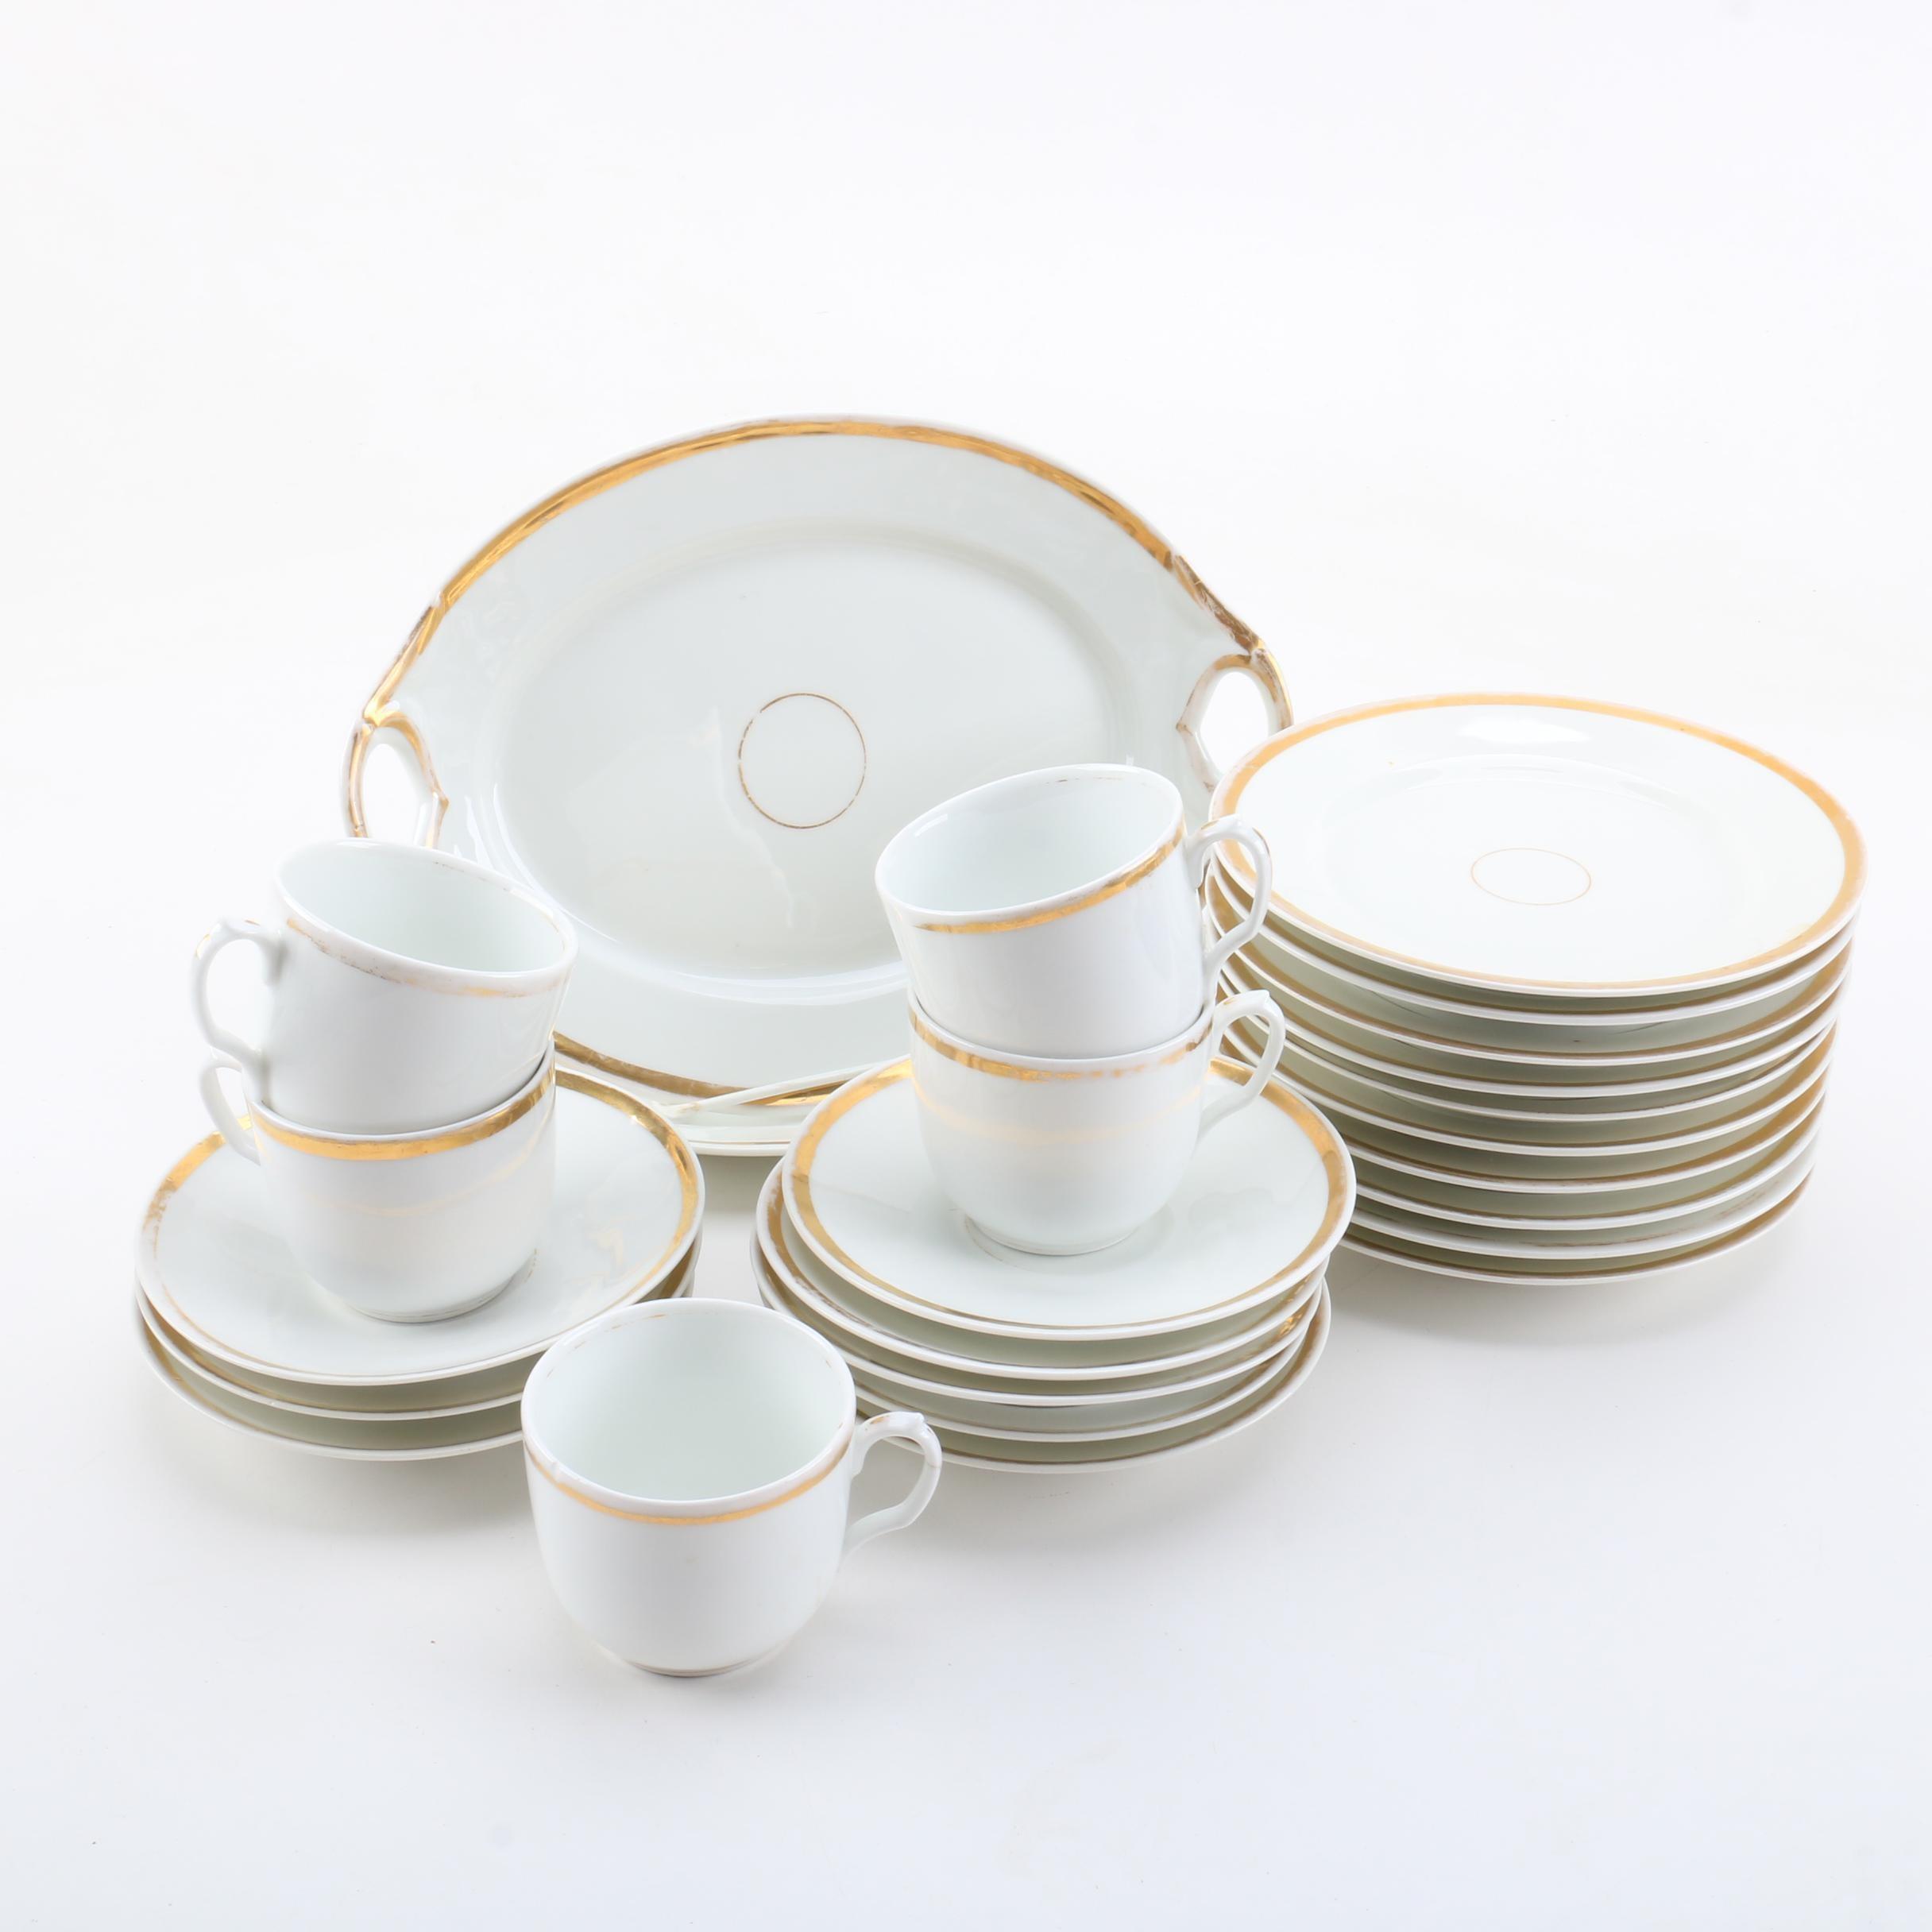 Old Paris Porcelain Tableware ... & Old Paris Porcelain Tableware : EBTH